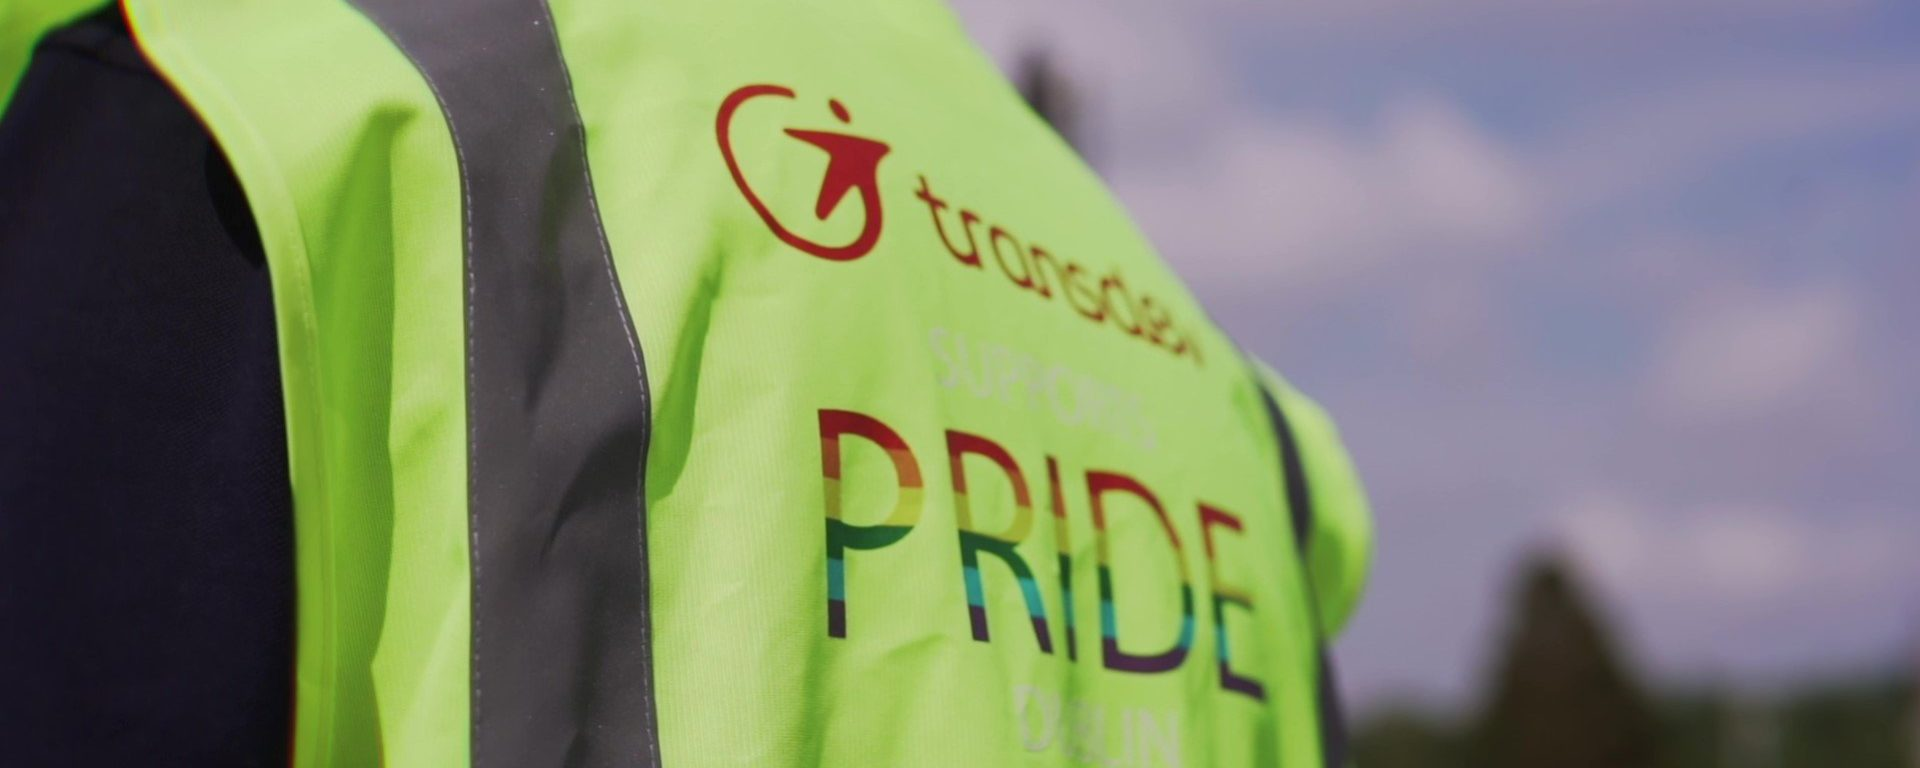 luas-together-in-pride-still_vest